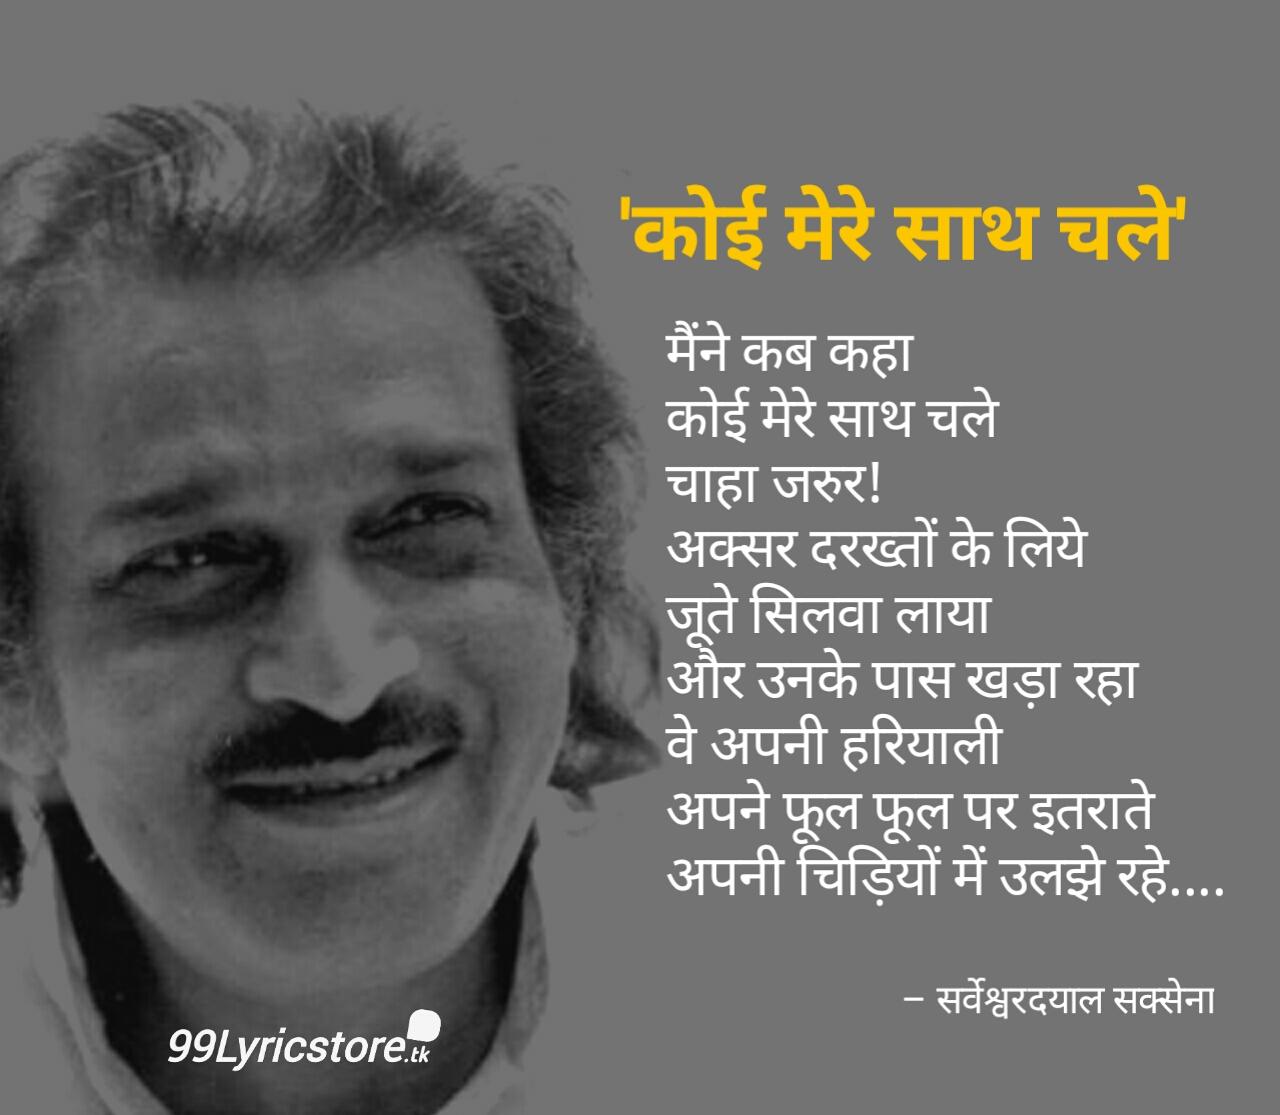 कोई मेरे साथ चले, हिन्दी कविता, सर्वेश्वरदयाल सक्सेना